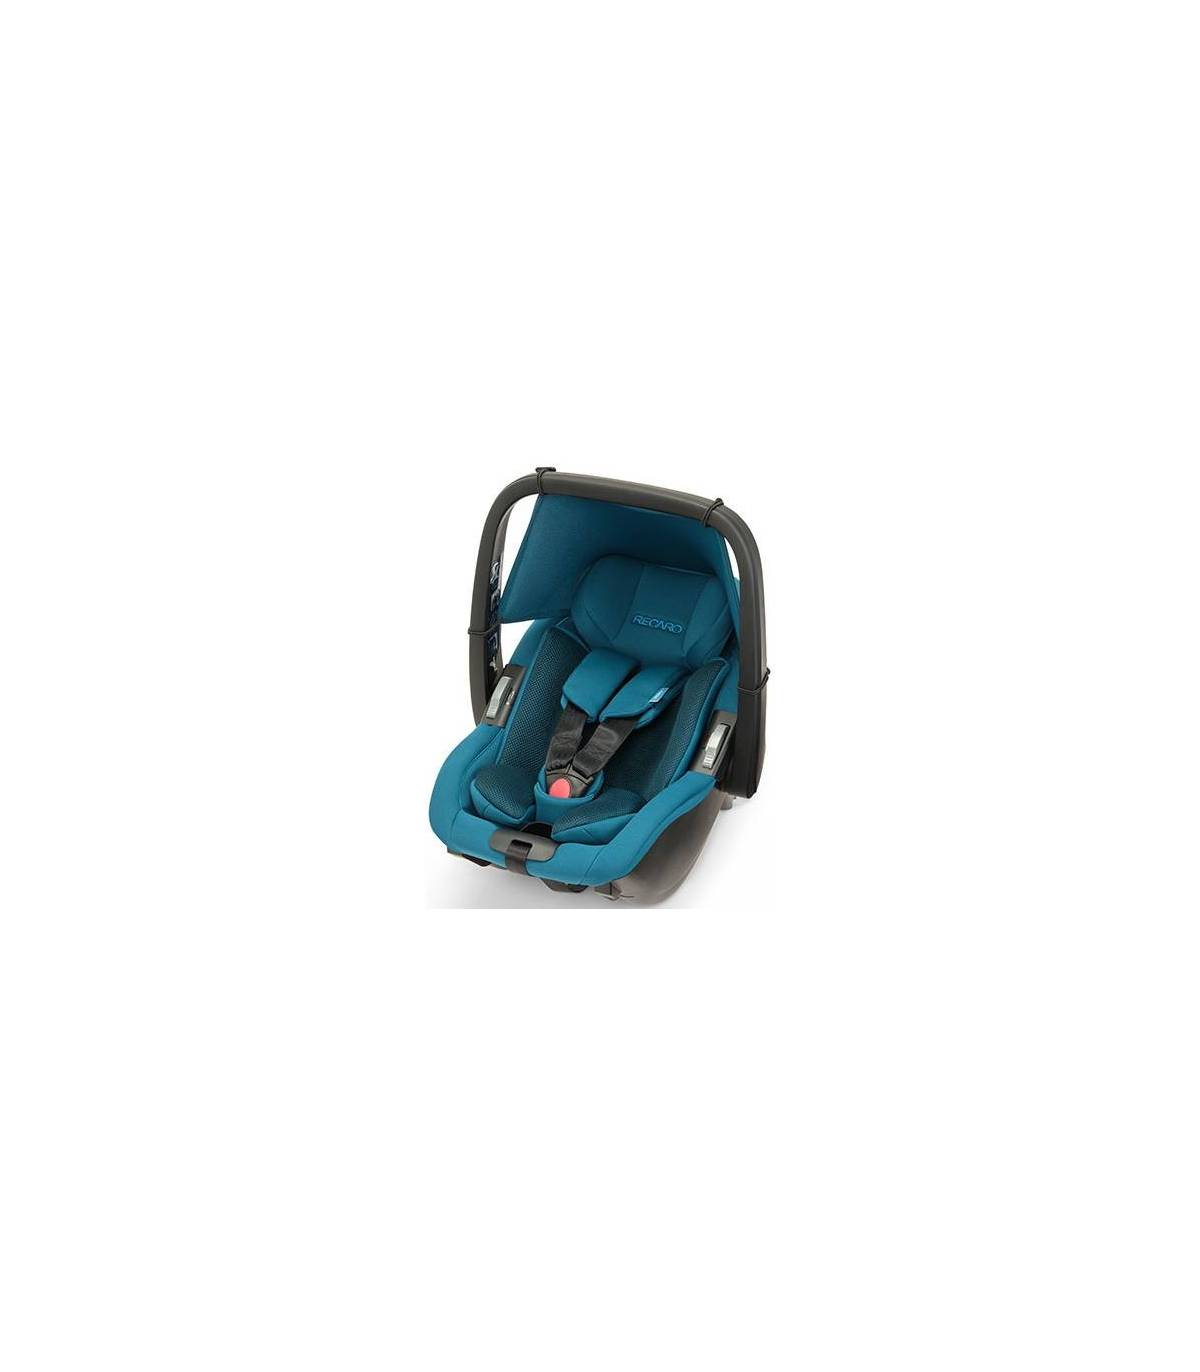 Recaro Salia Elite i-Size Select Teal Green (0-18 kg / bis 105 cm / i-Size R129)